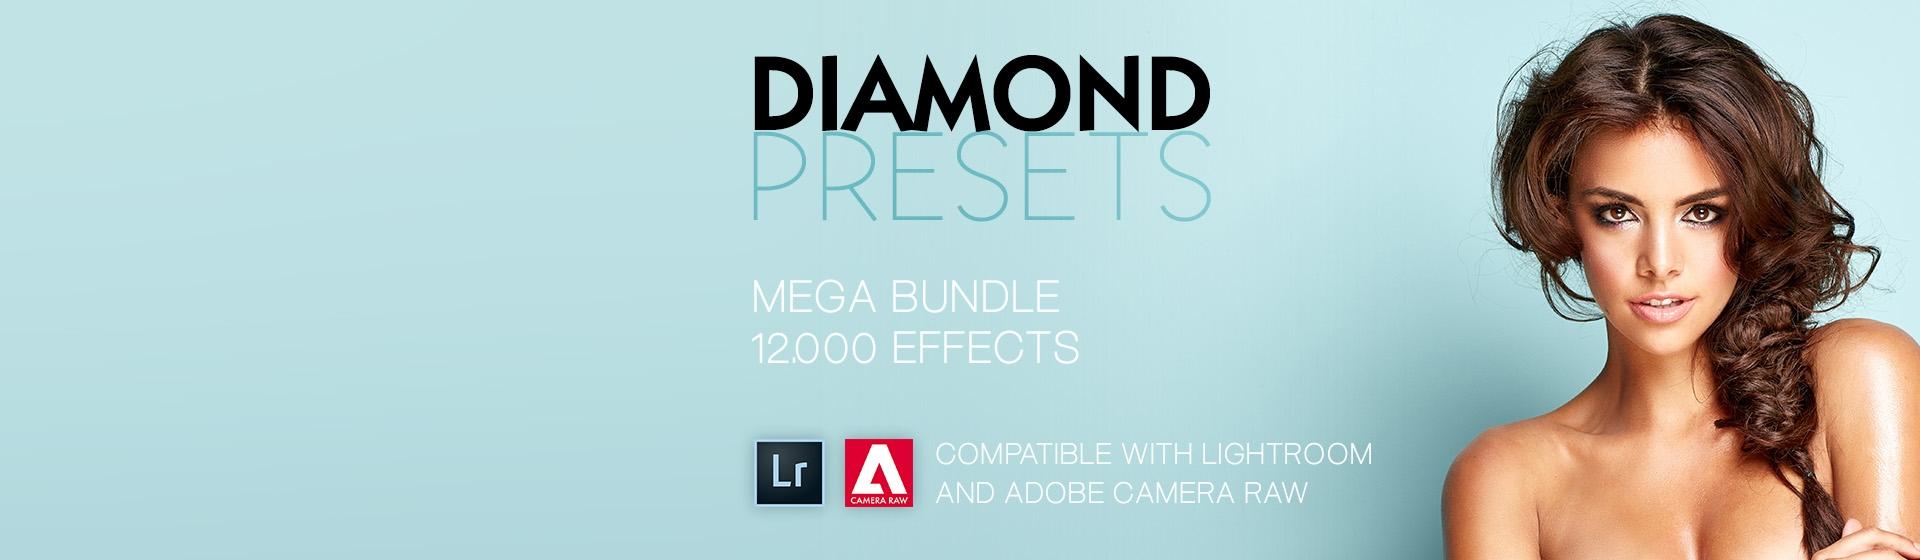 Diamond Presets